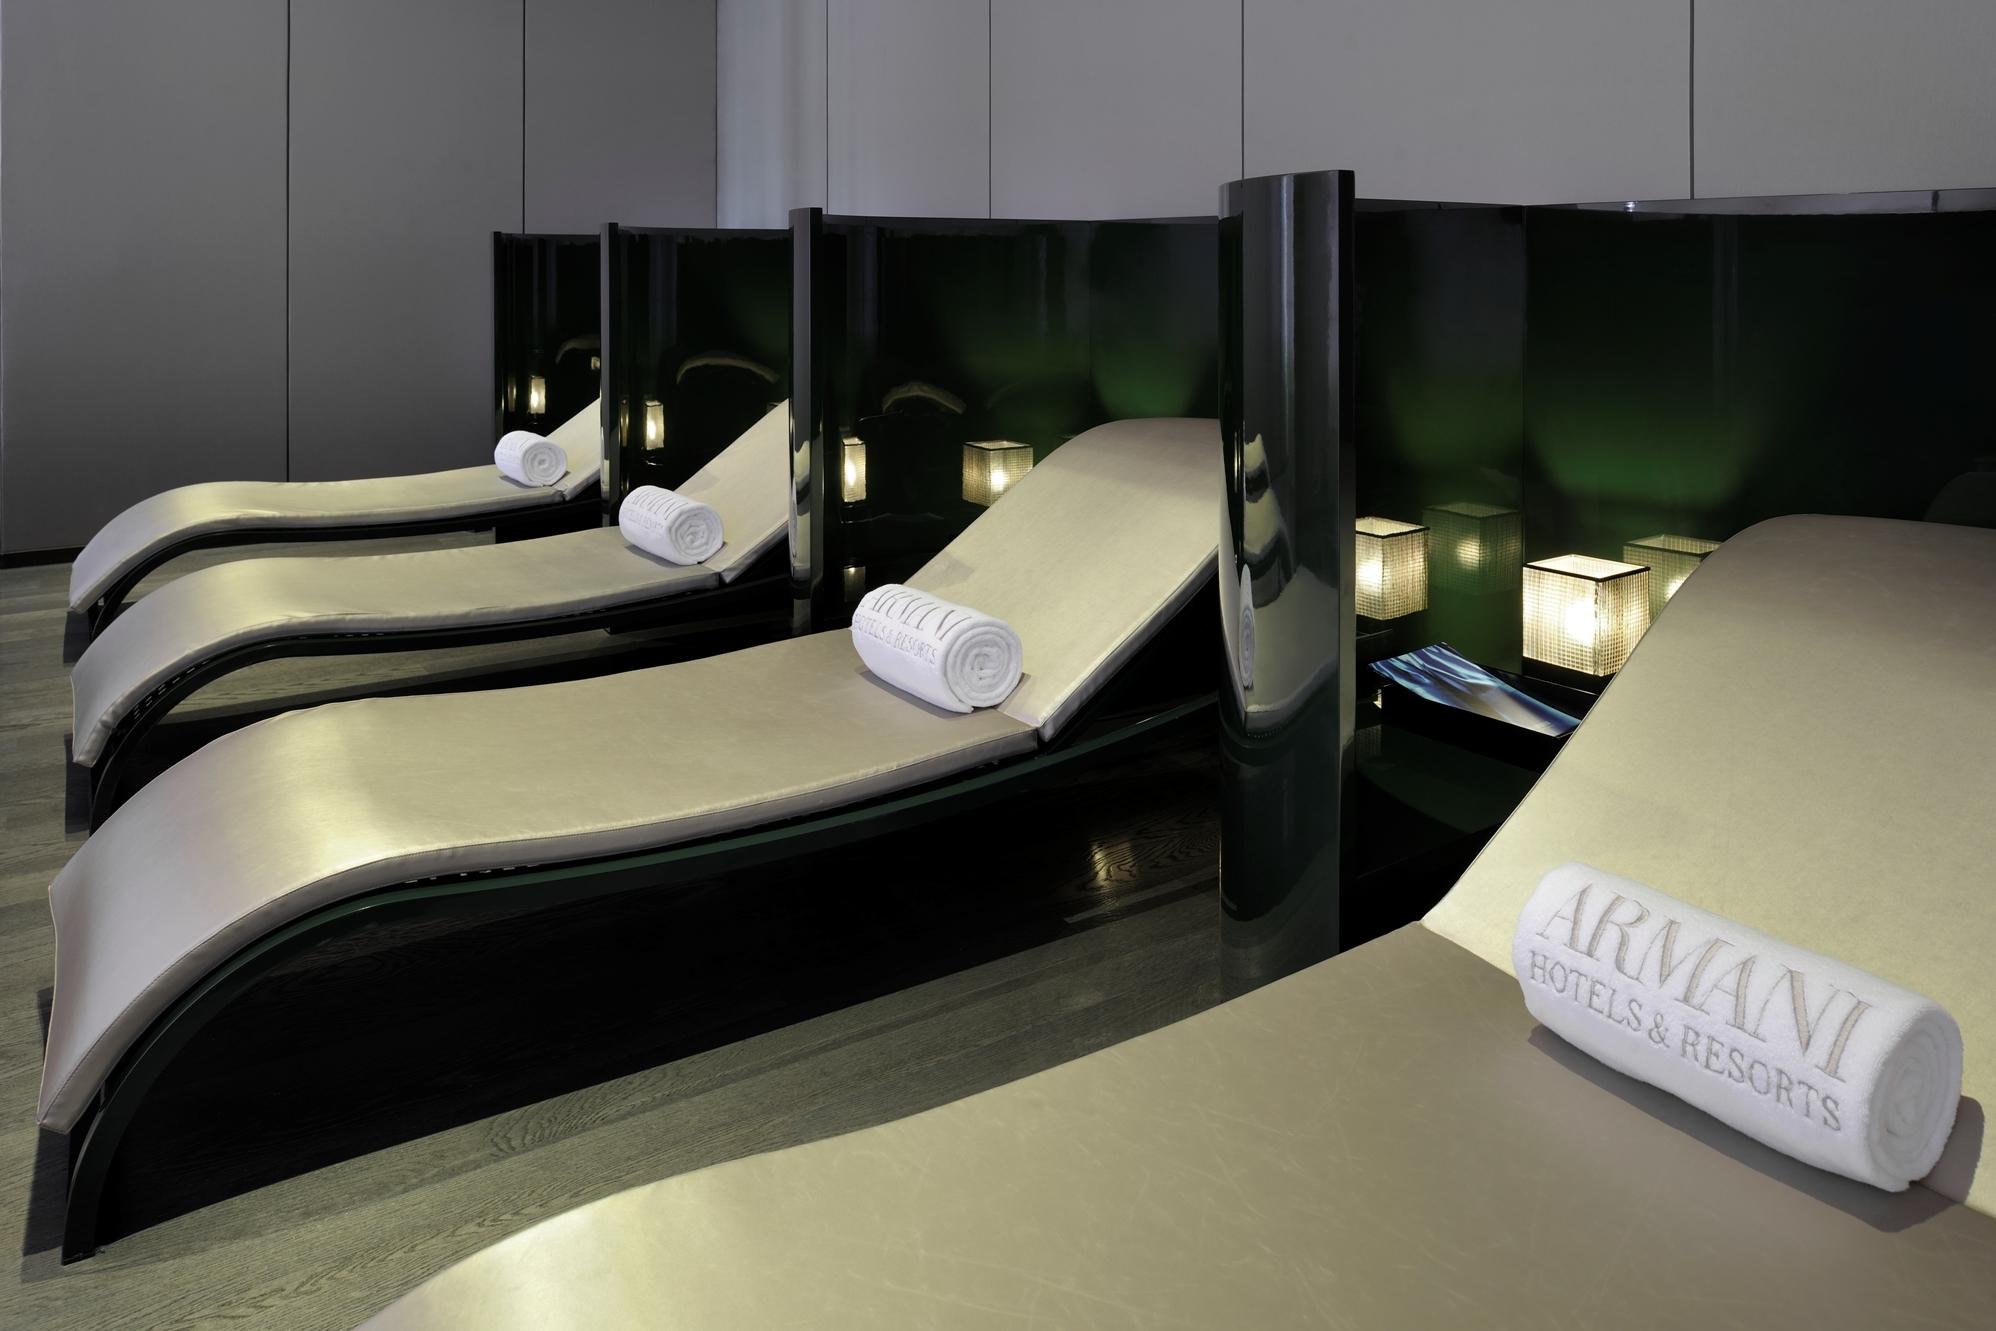 Armani Spa - Relaxation Lounge4